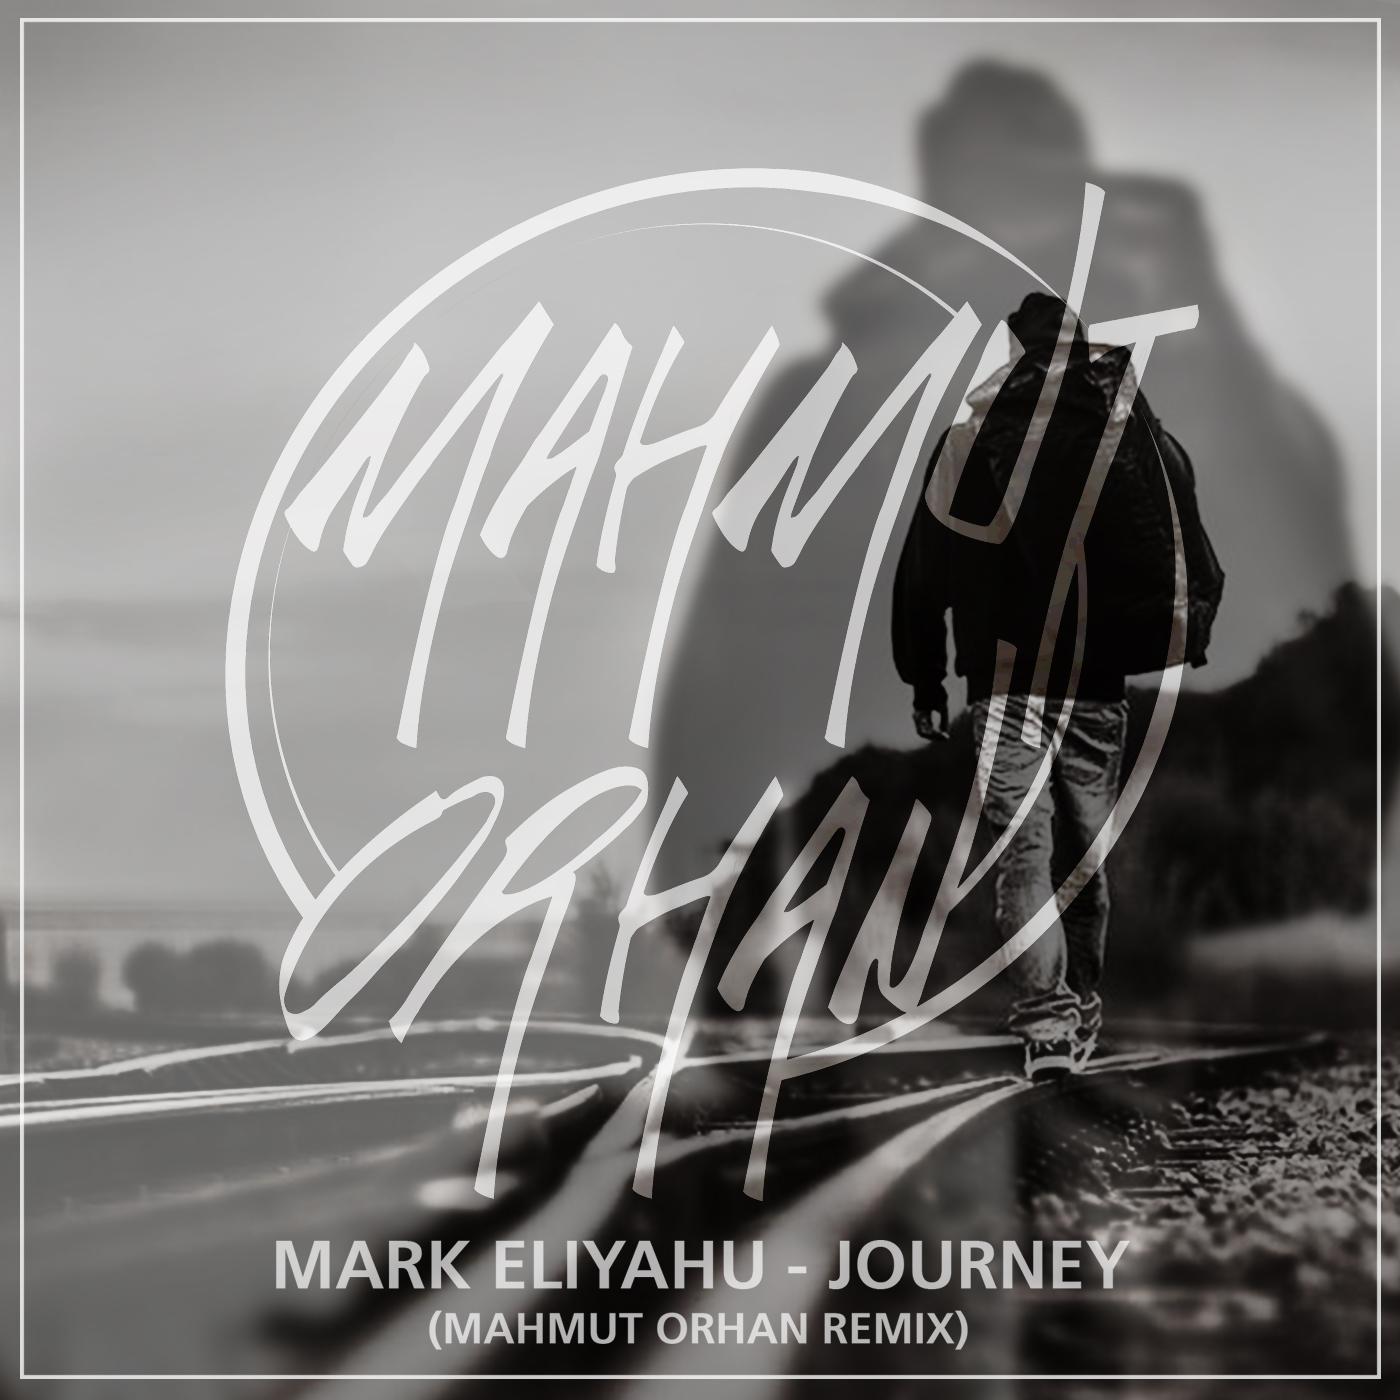 Download Mark Eliyahu Journey Mahmut Orhan Remix By Mahmut Orhan Podcast Remixes Mp3 Soundcloud To Mp3 Converter